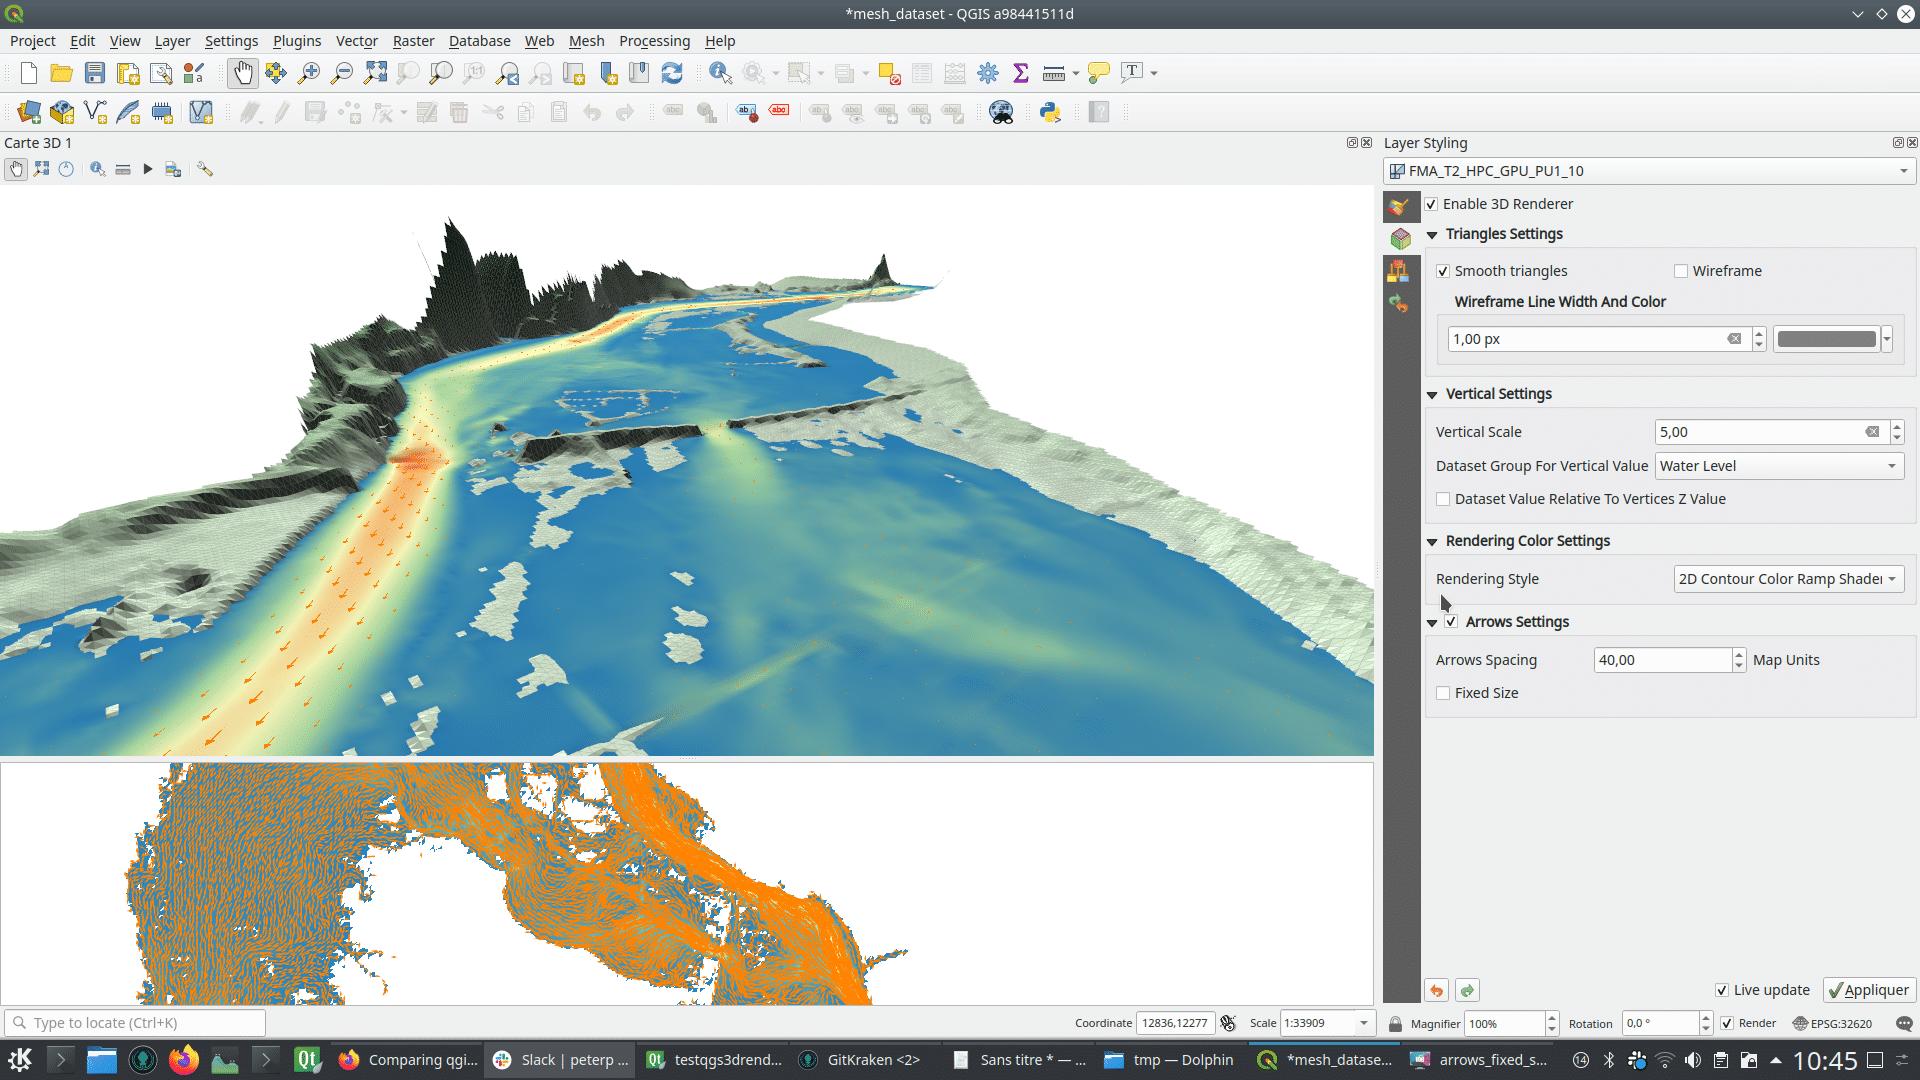 Vista 3D con datos de malla. Fuente: Lutra Consulting